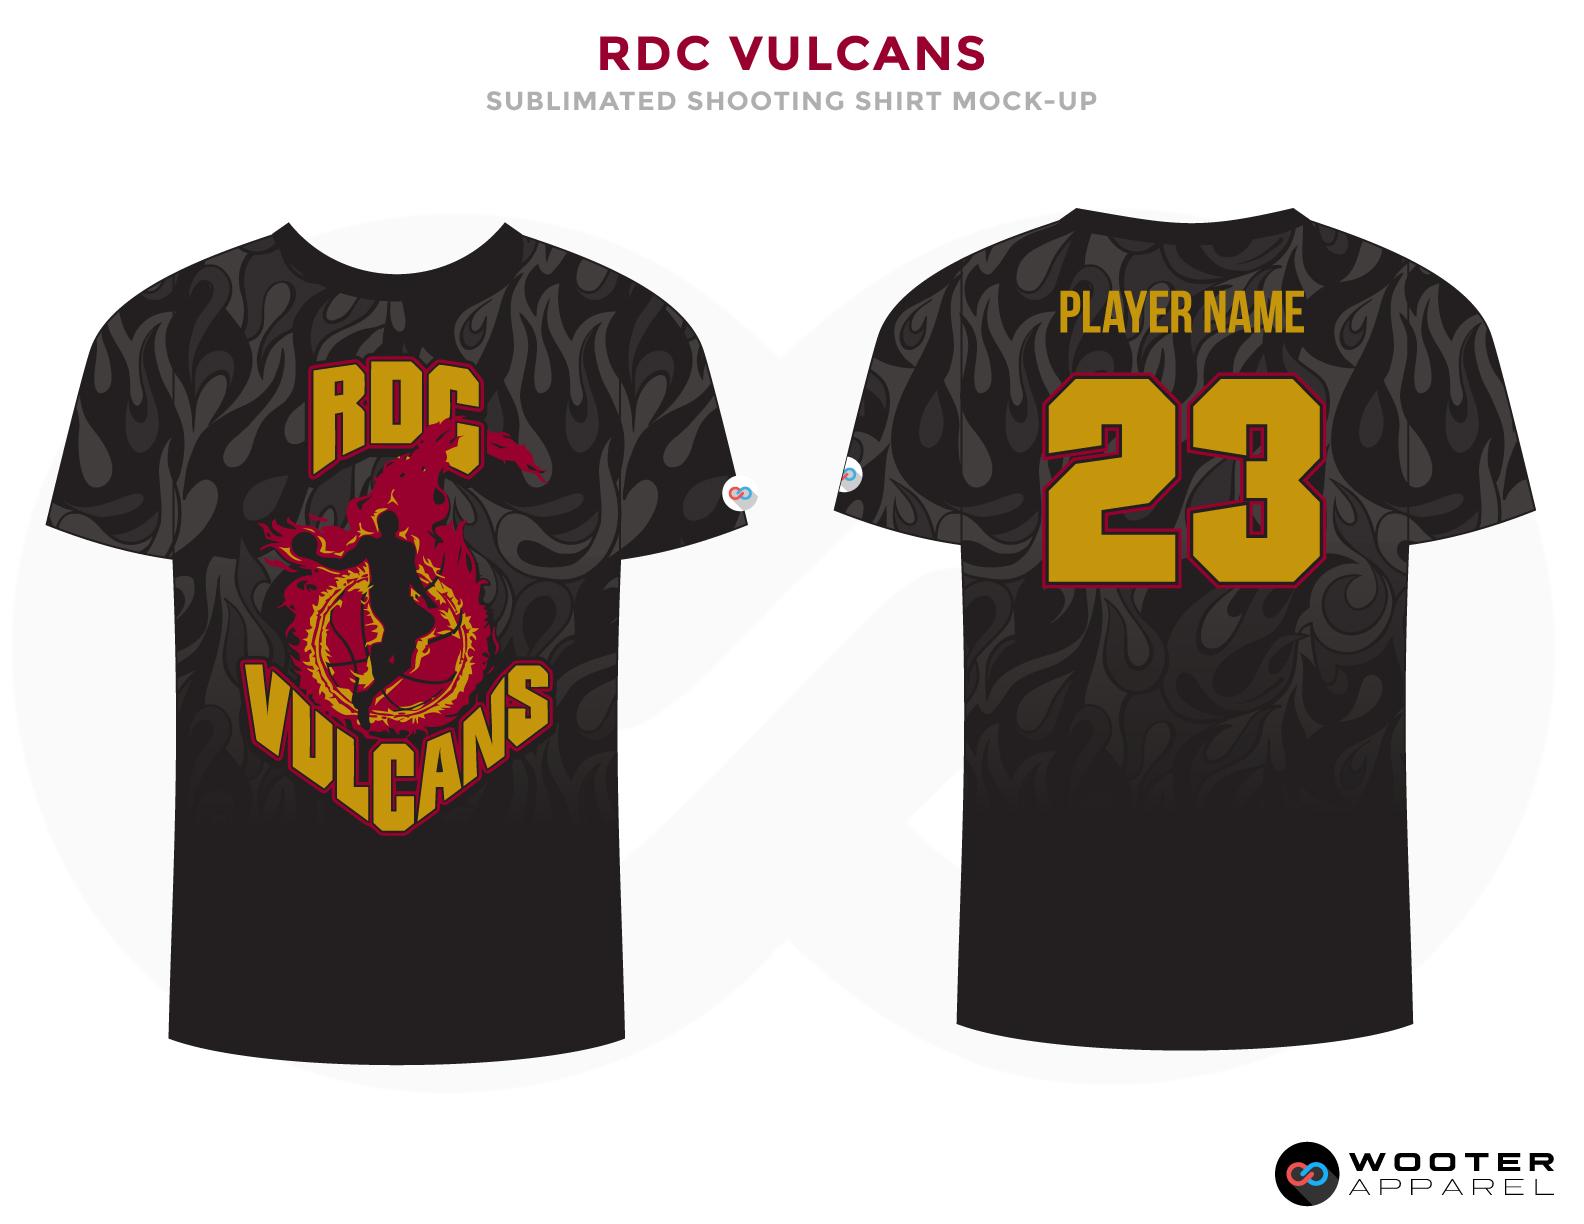 RDC VULCANS Black Golden and Red Premium Shooting Shirt